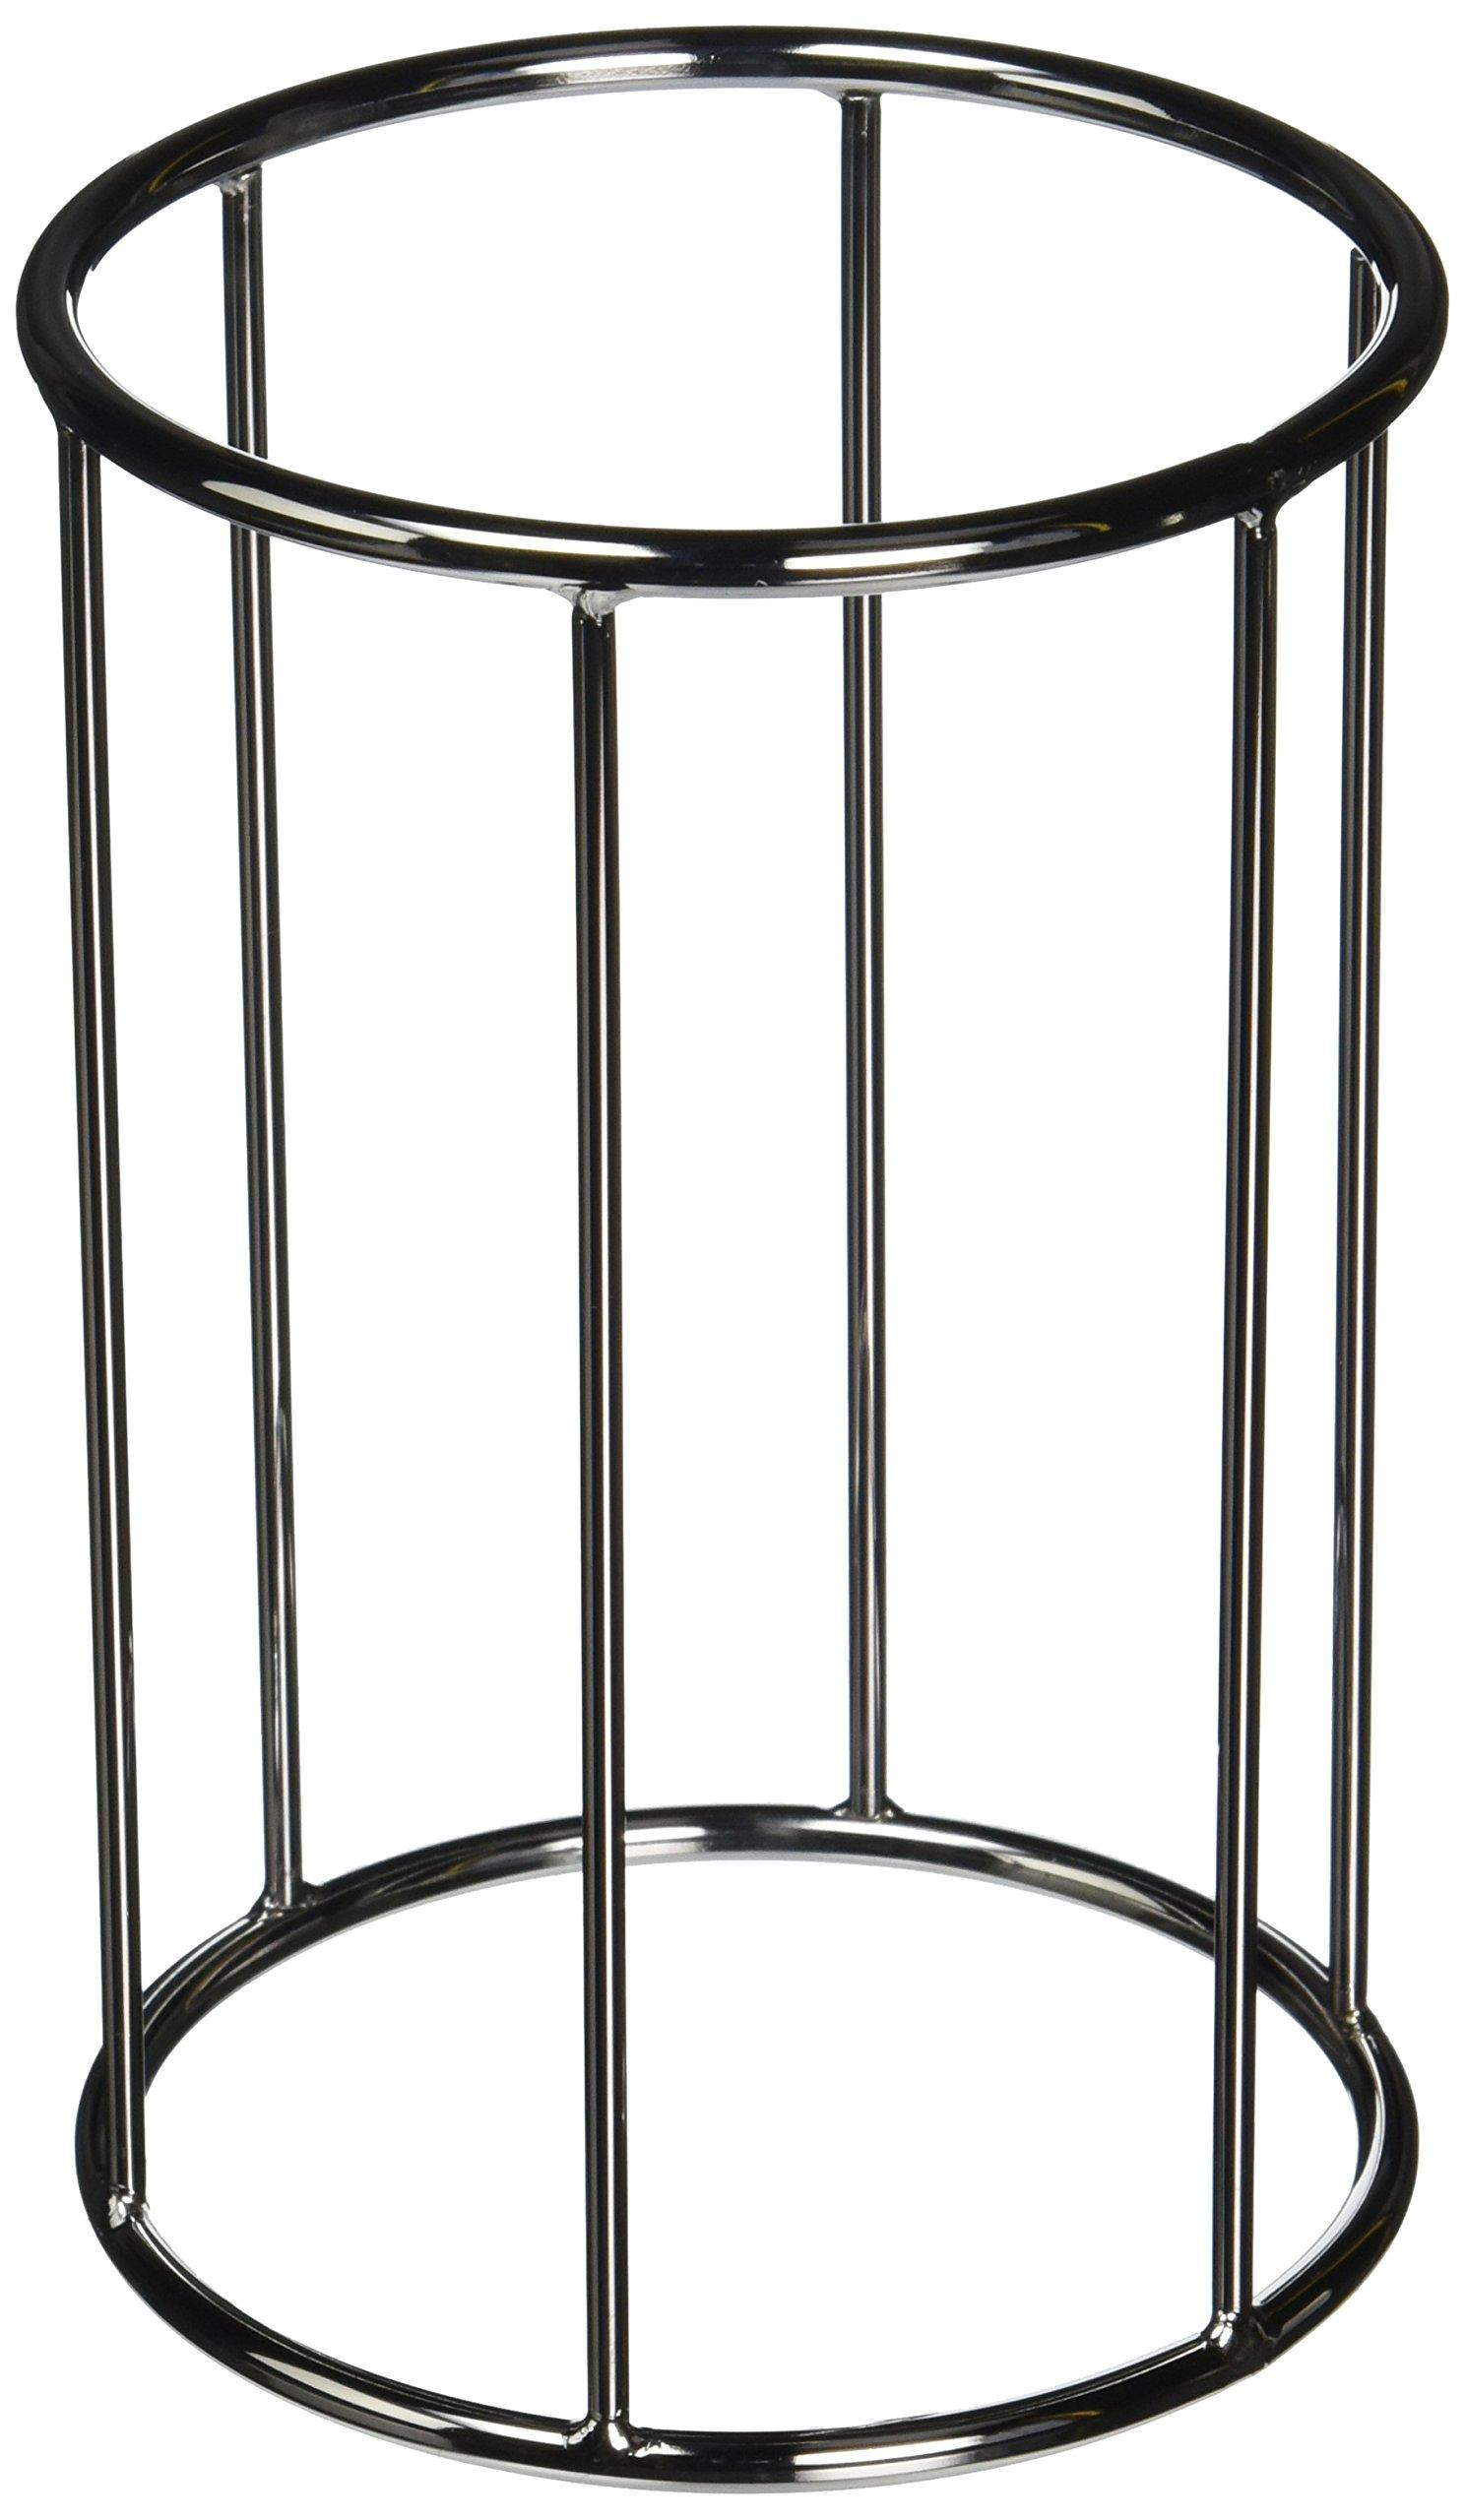 Derma Sciences GL234 Tubular Gauze Metal Cage Applicator, 3-Medium Size